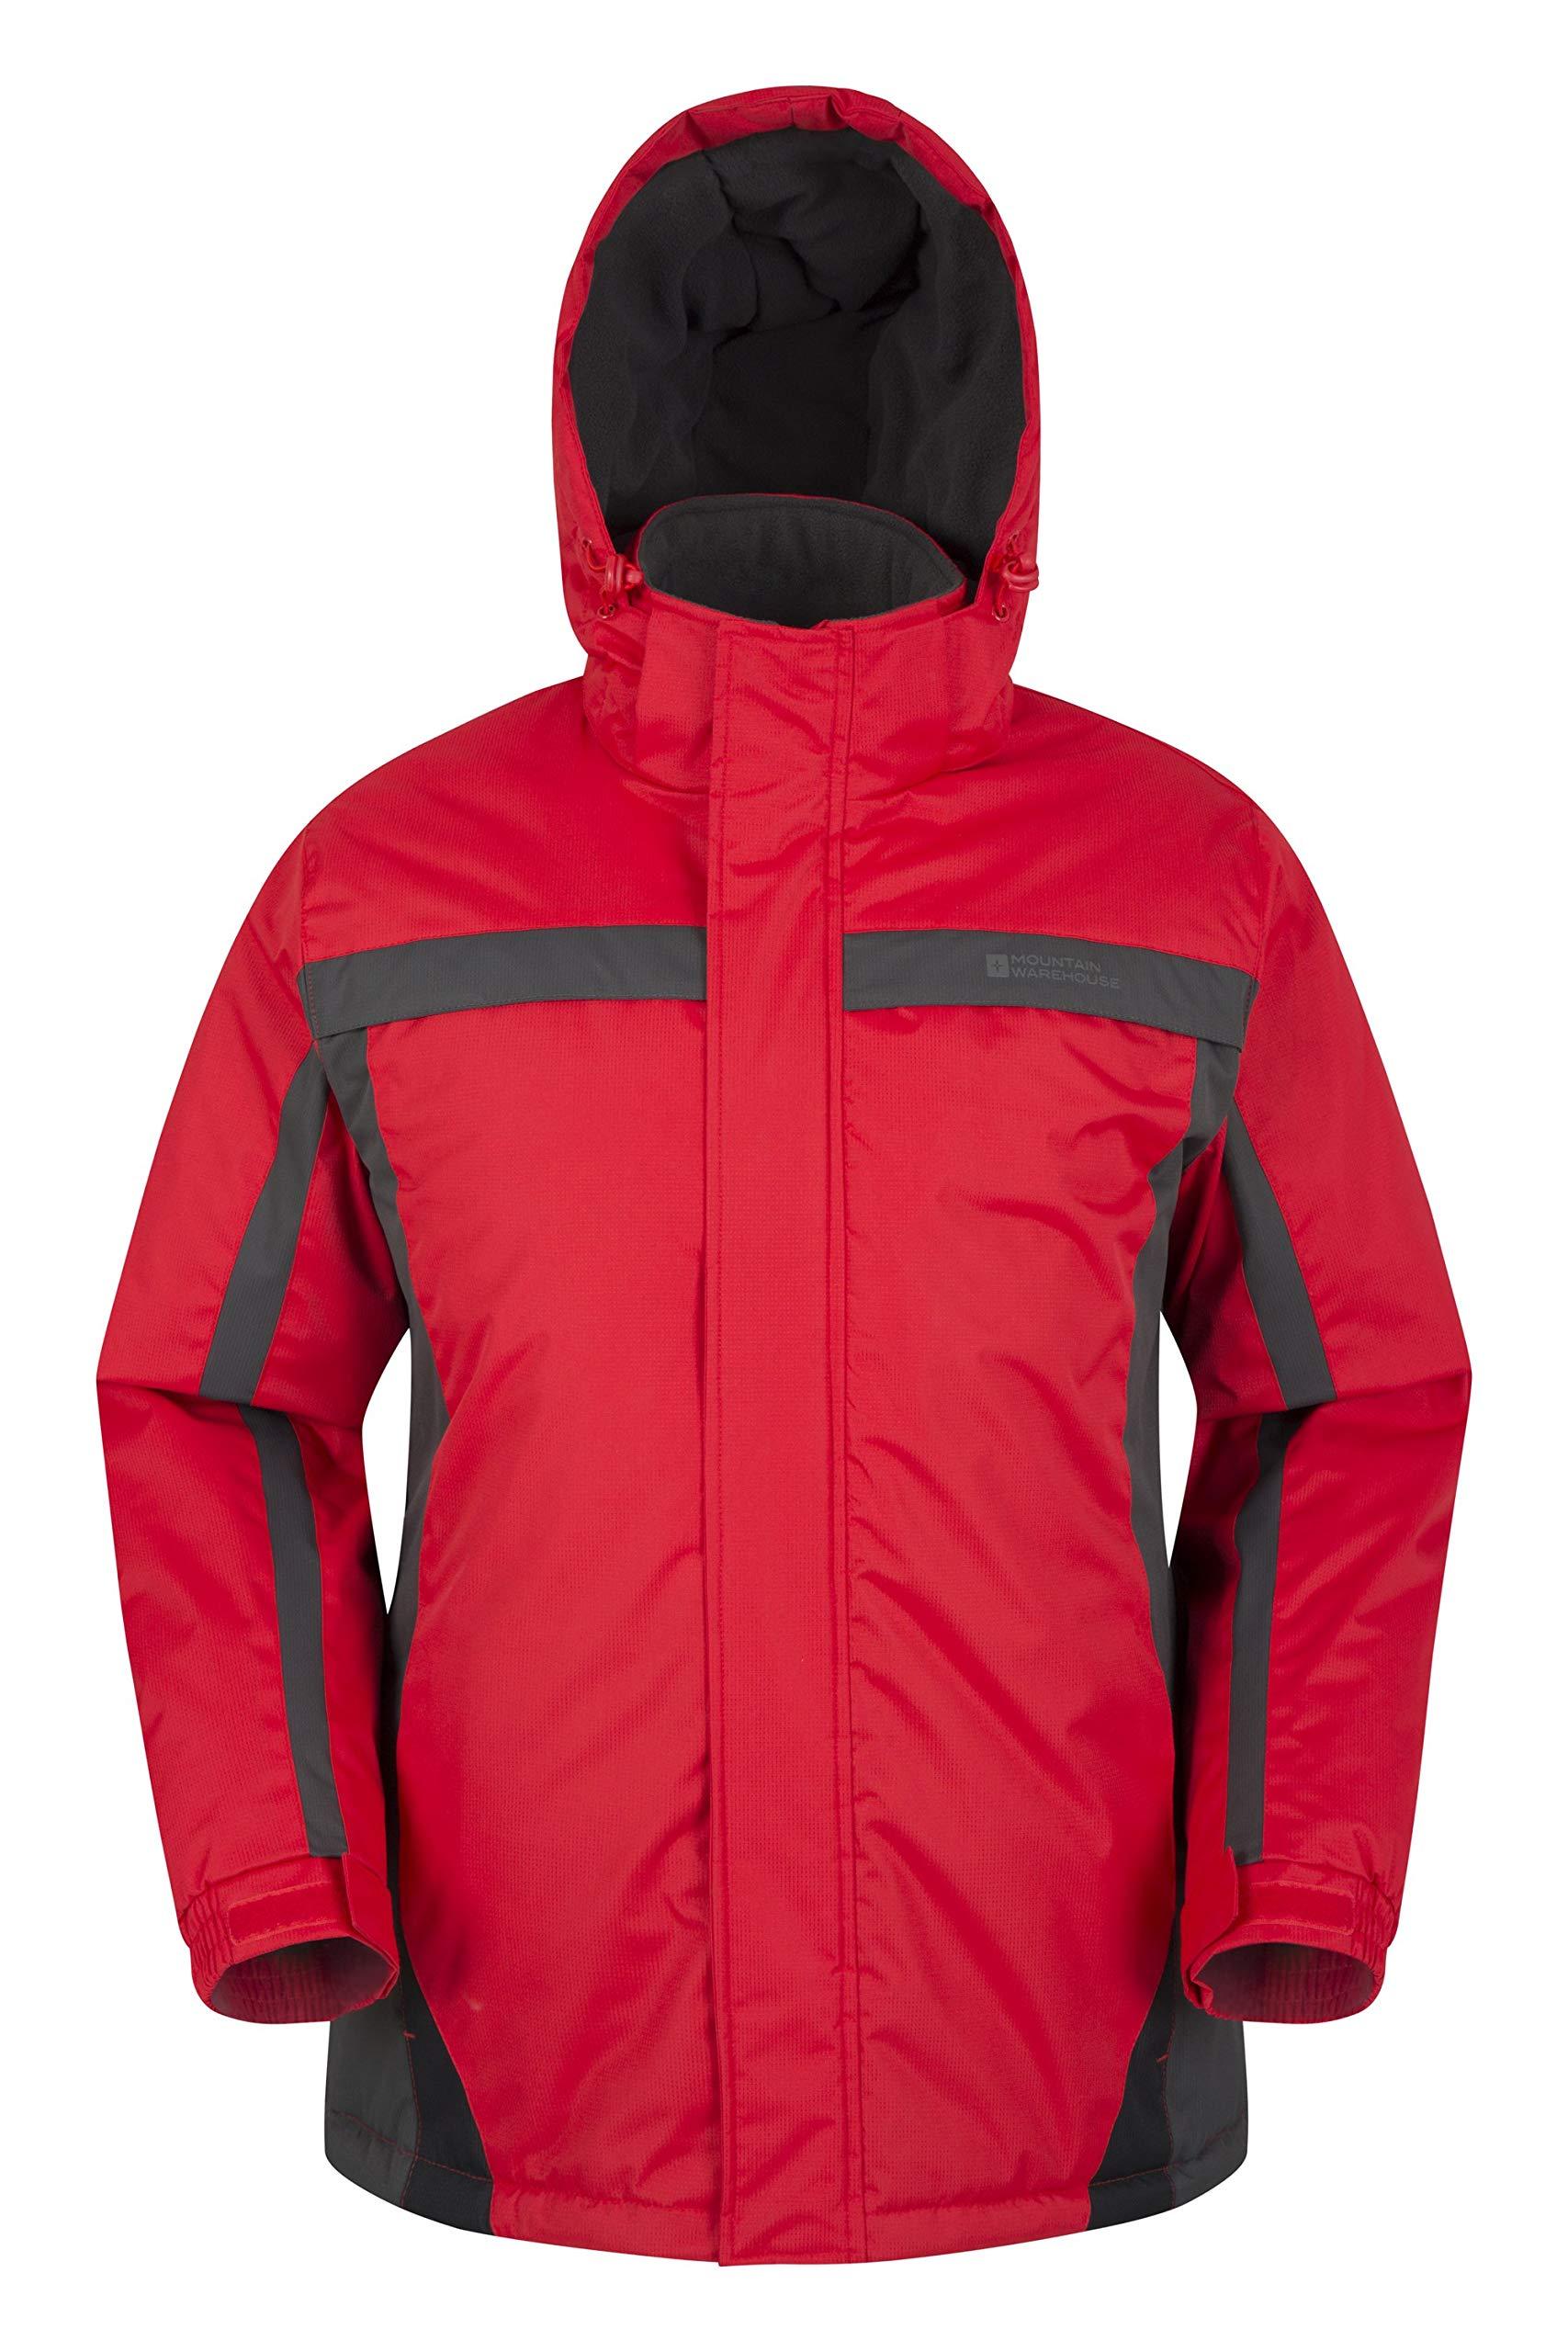 Mountain Warehouse Dusk Mens Ski Jacket - Water Resistant Winter Coat